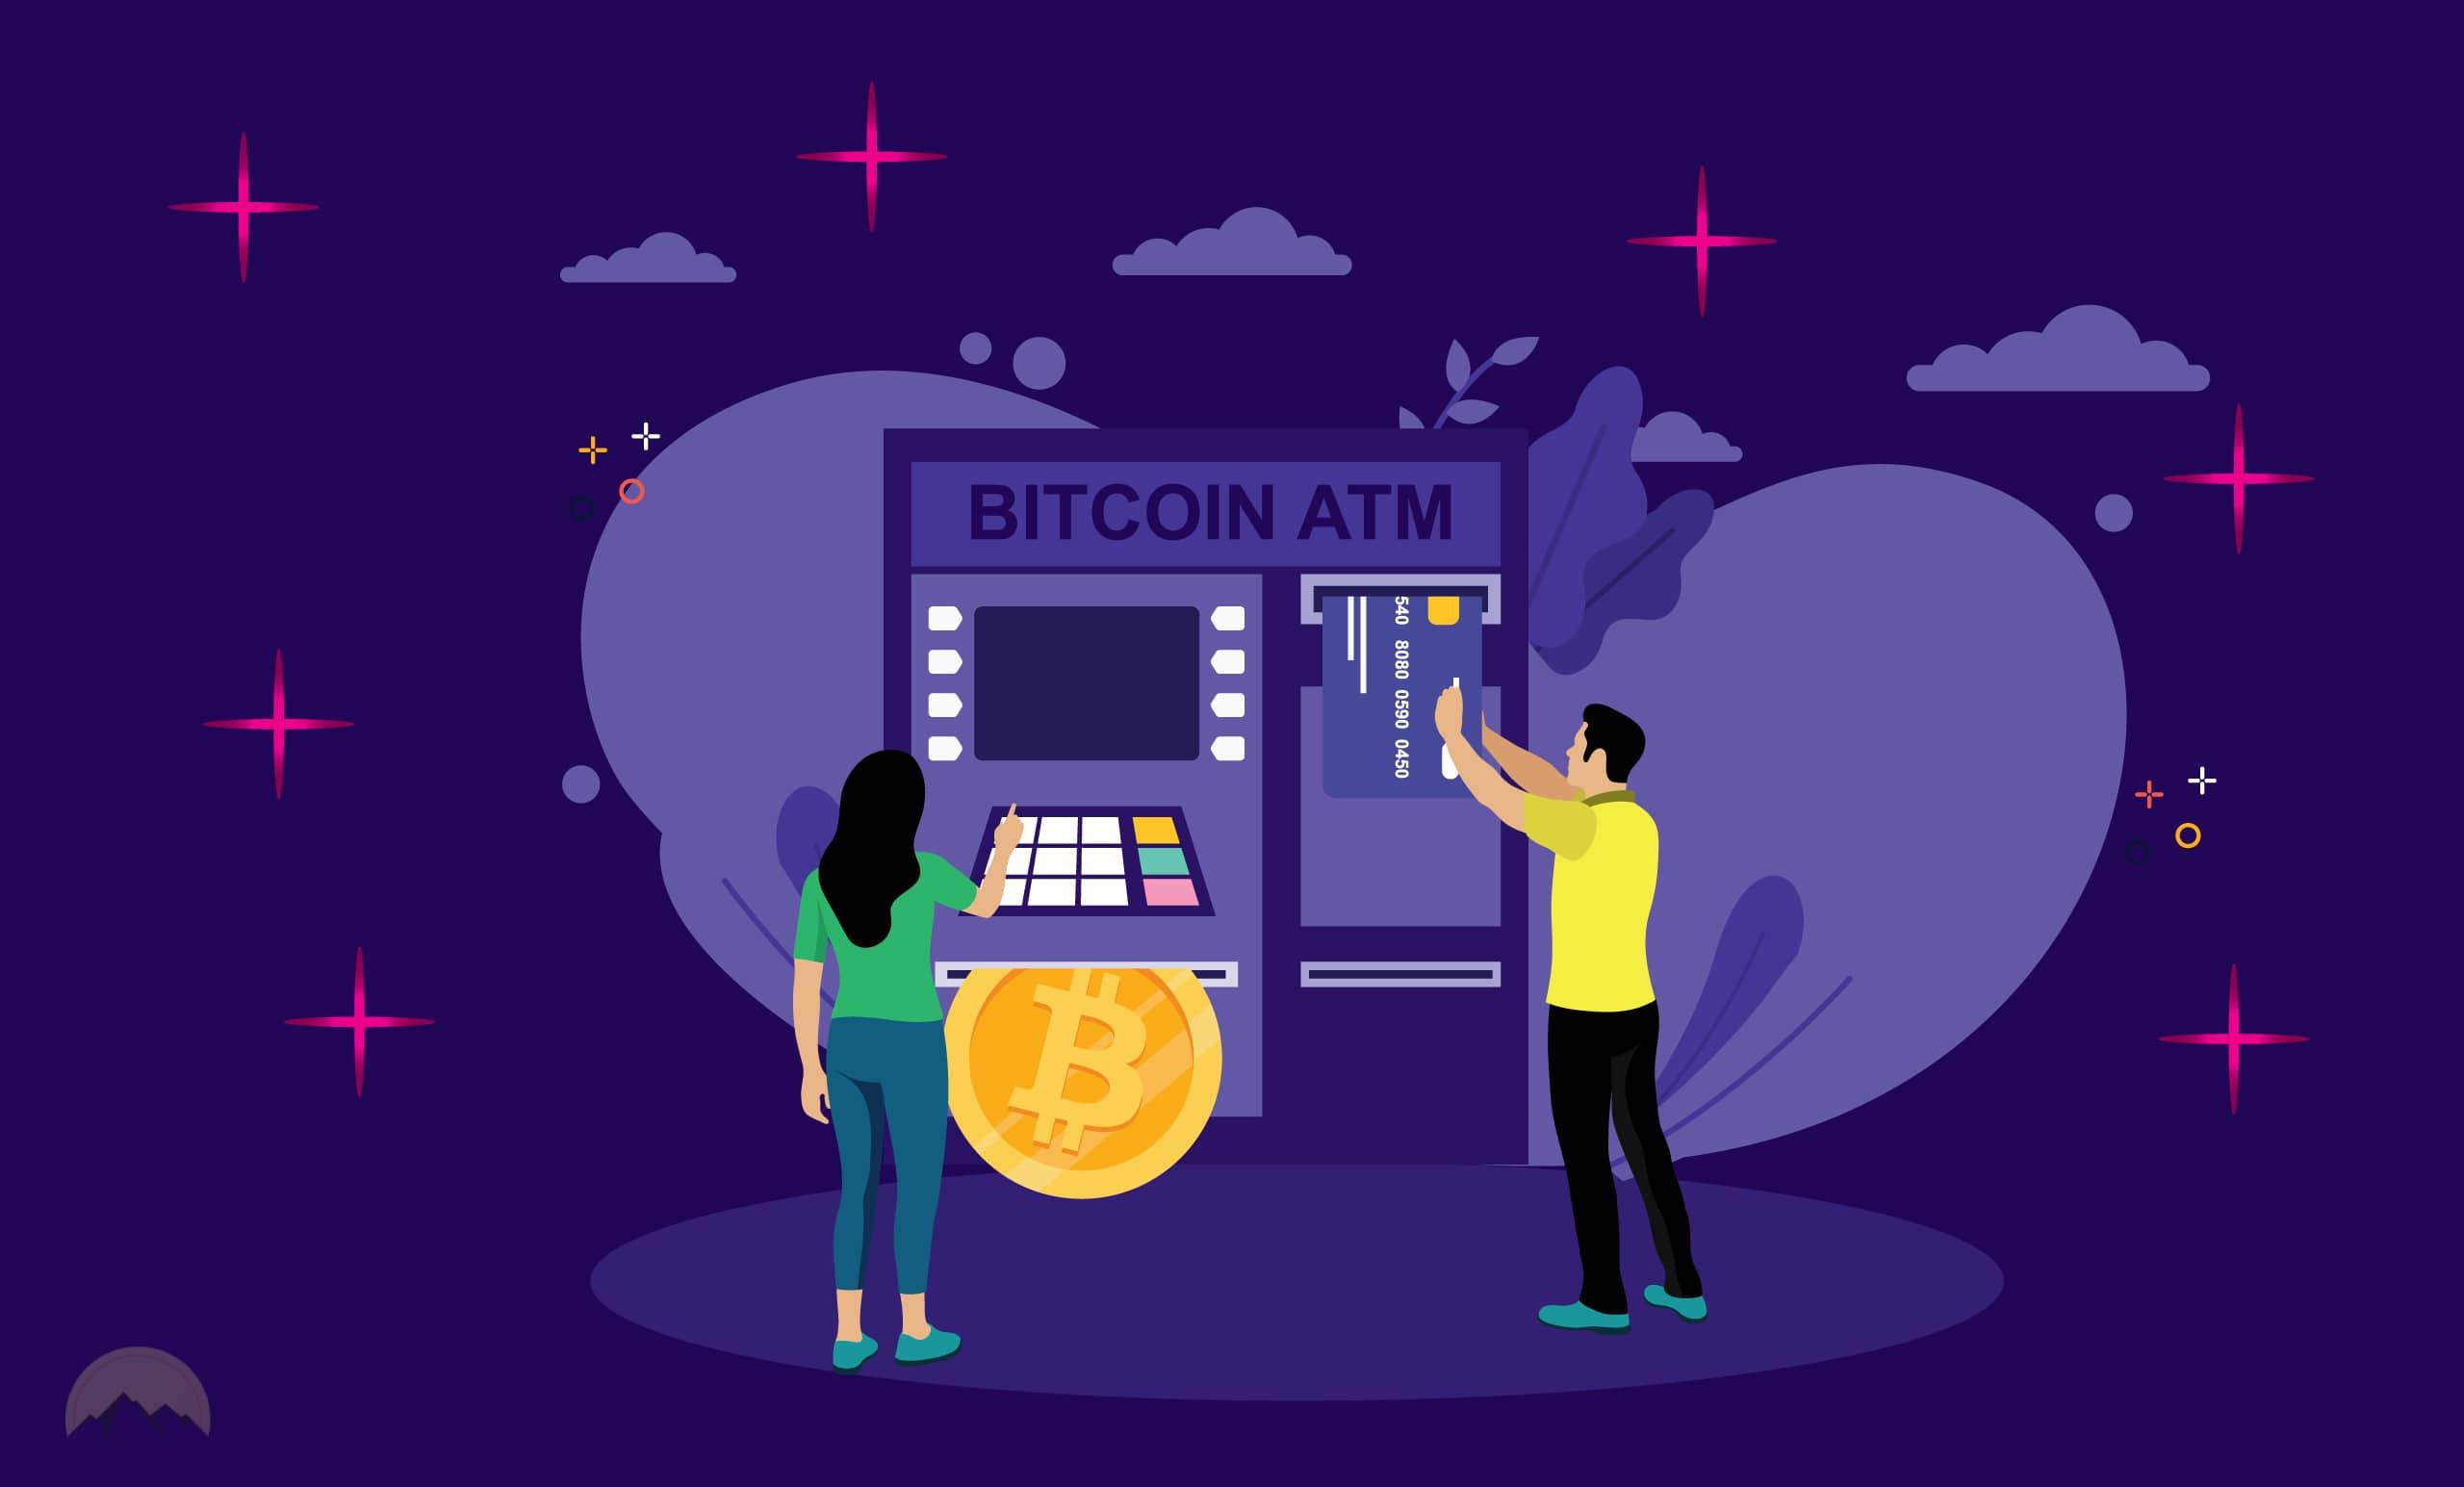 How Do I Use A Bitcoin ATM With A Debit Card?